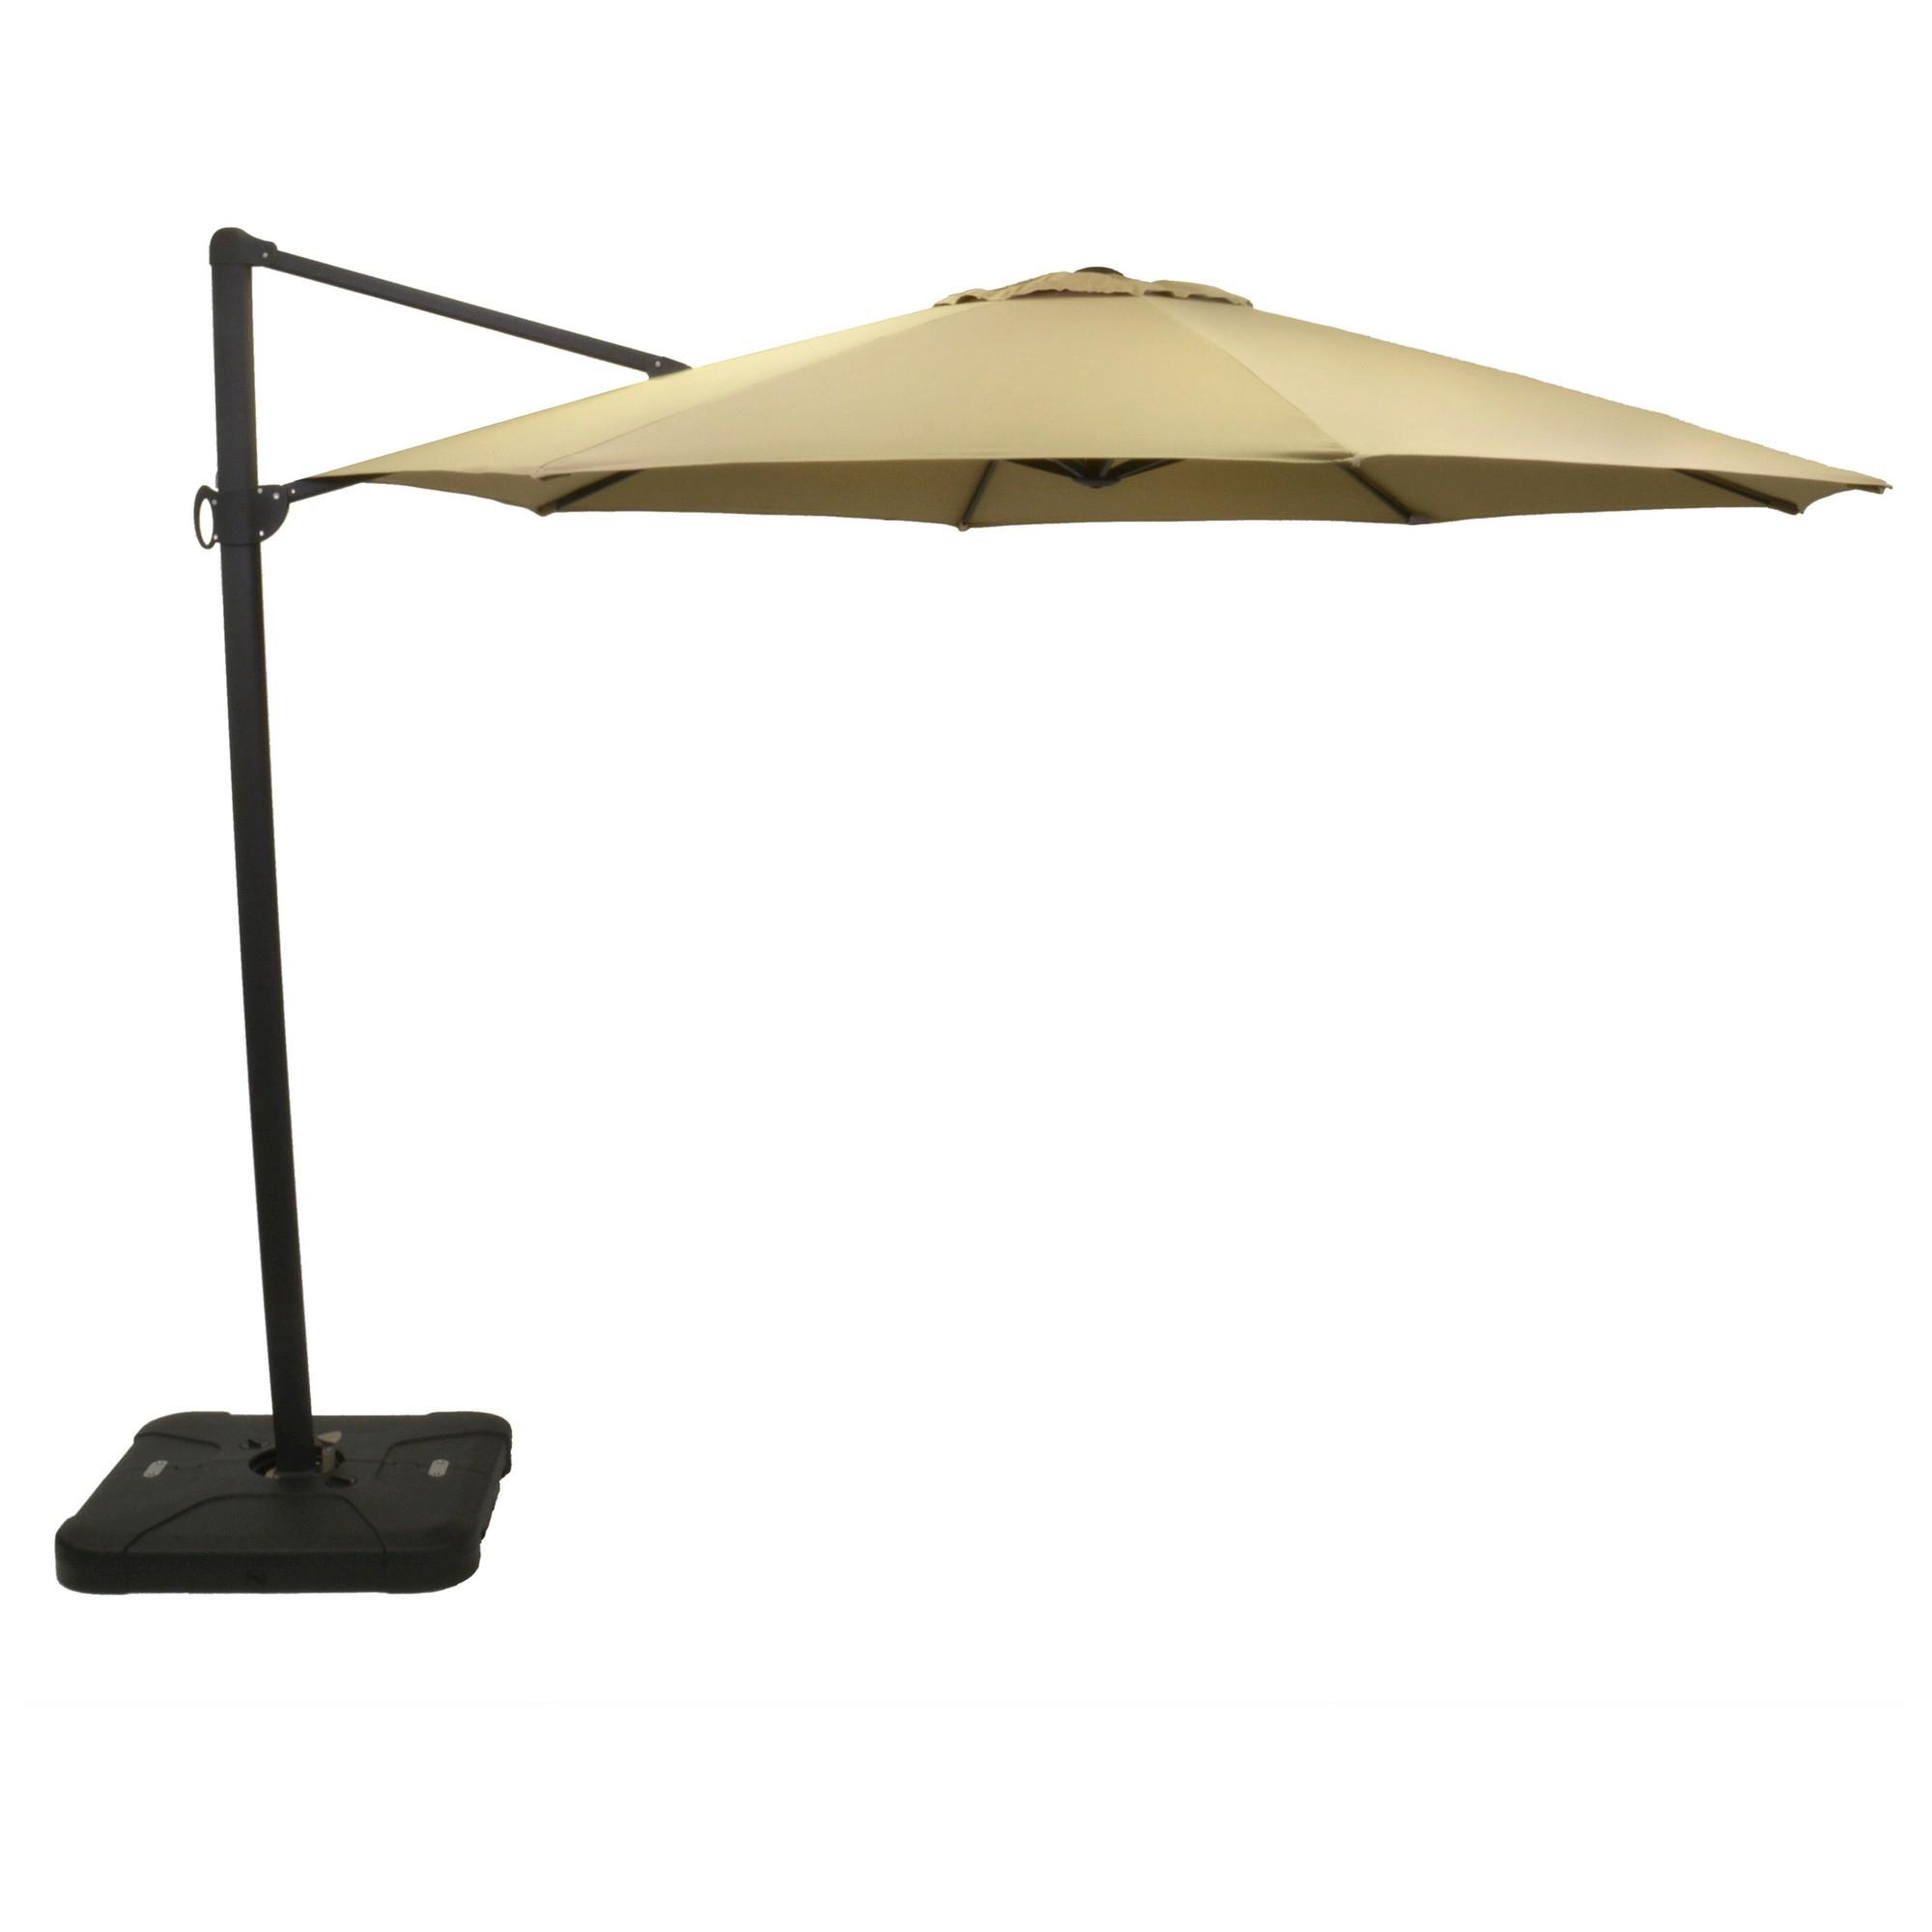 Kedzie Outdoor Cantilever Umbrellas With Best And Newest 11' Offset Sunbrella Umbrella – Canvas Heather Beige – Black Pole (View 5 of 20)